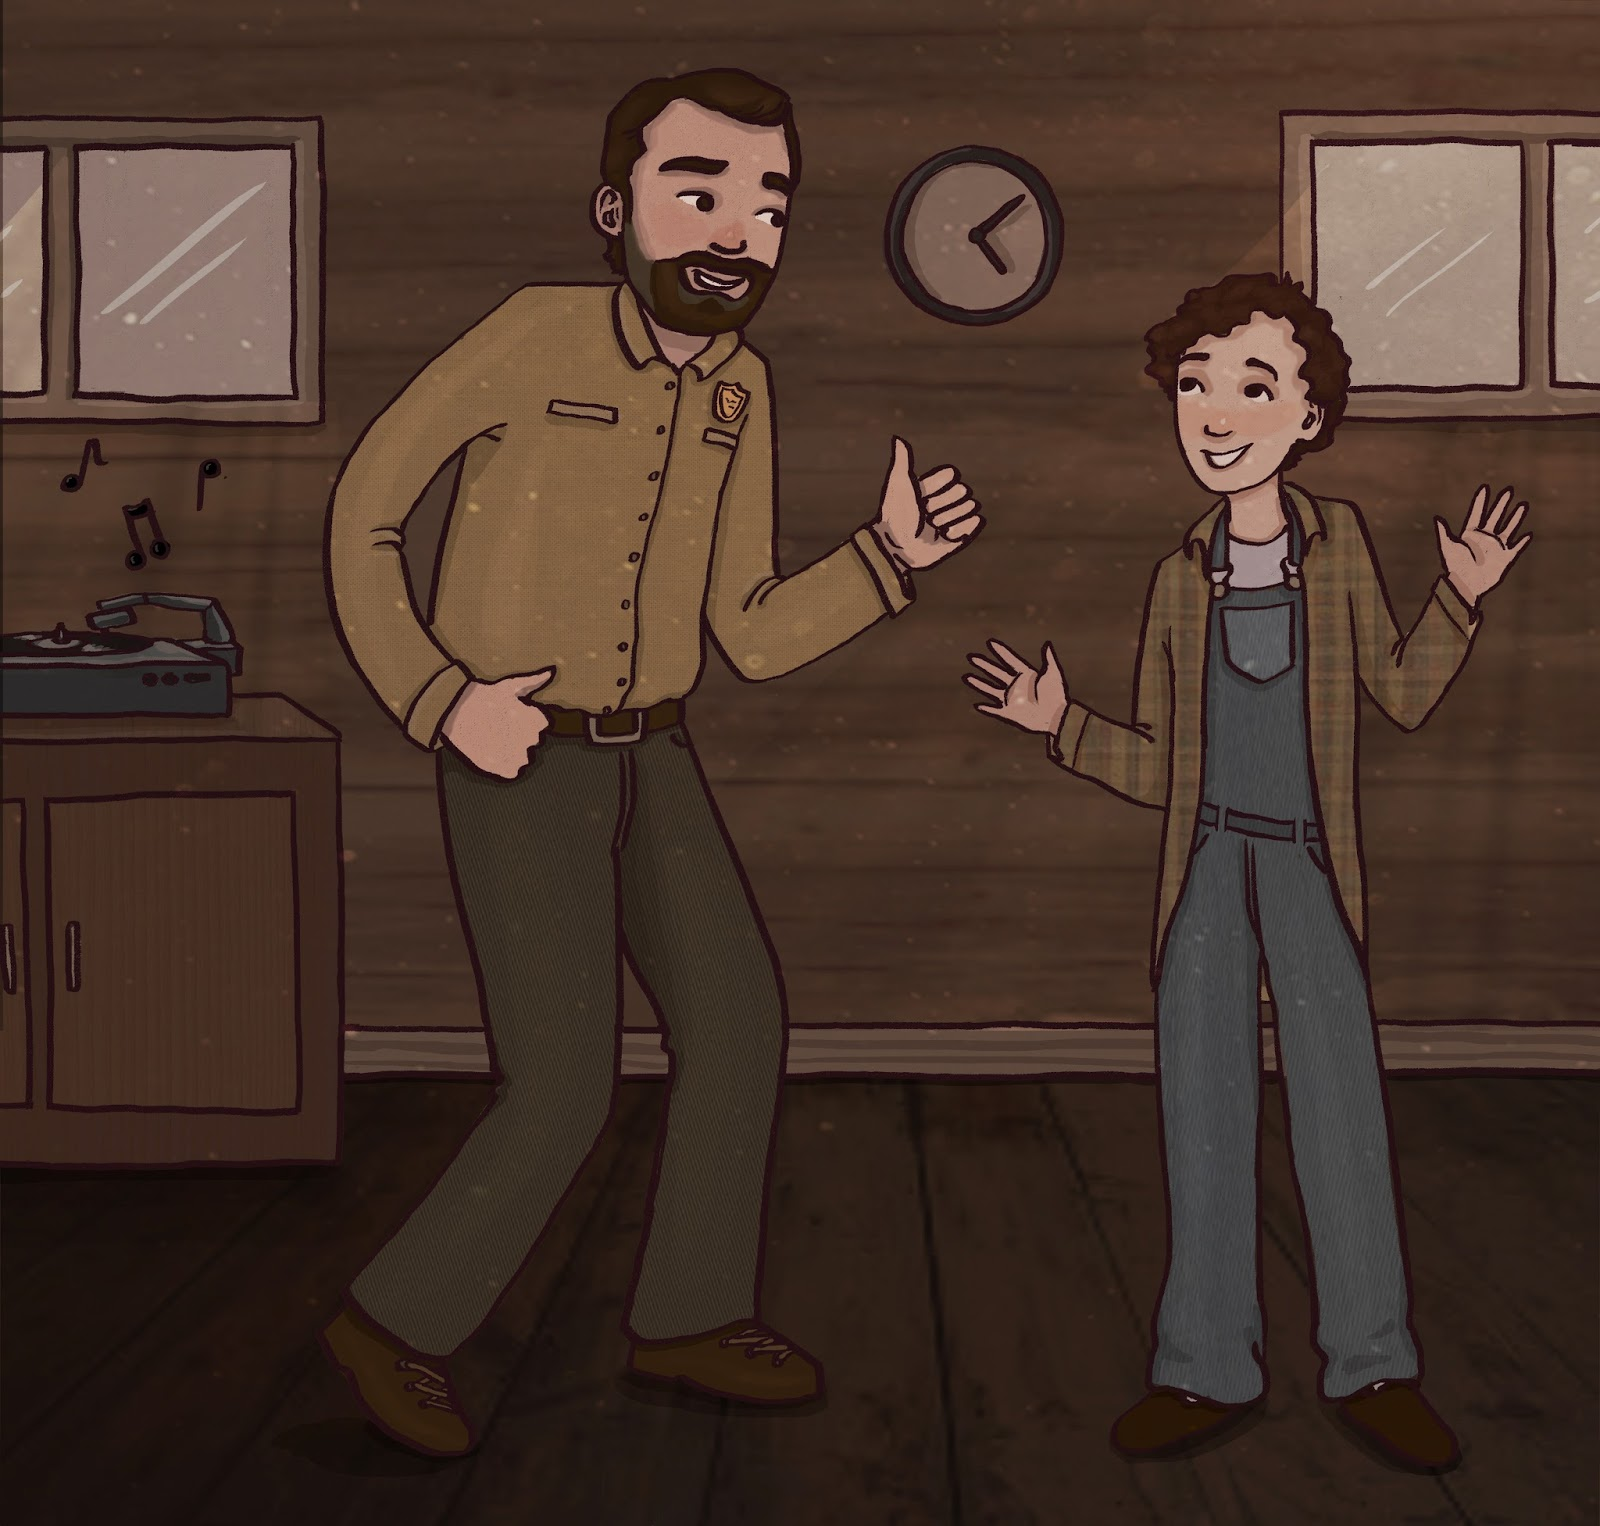 Art by Natasha: Stranger Things Fan Art: Hopper and Eleven Dancing